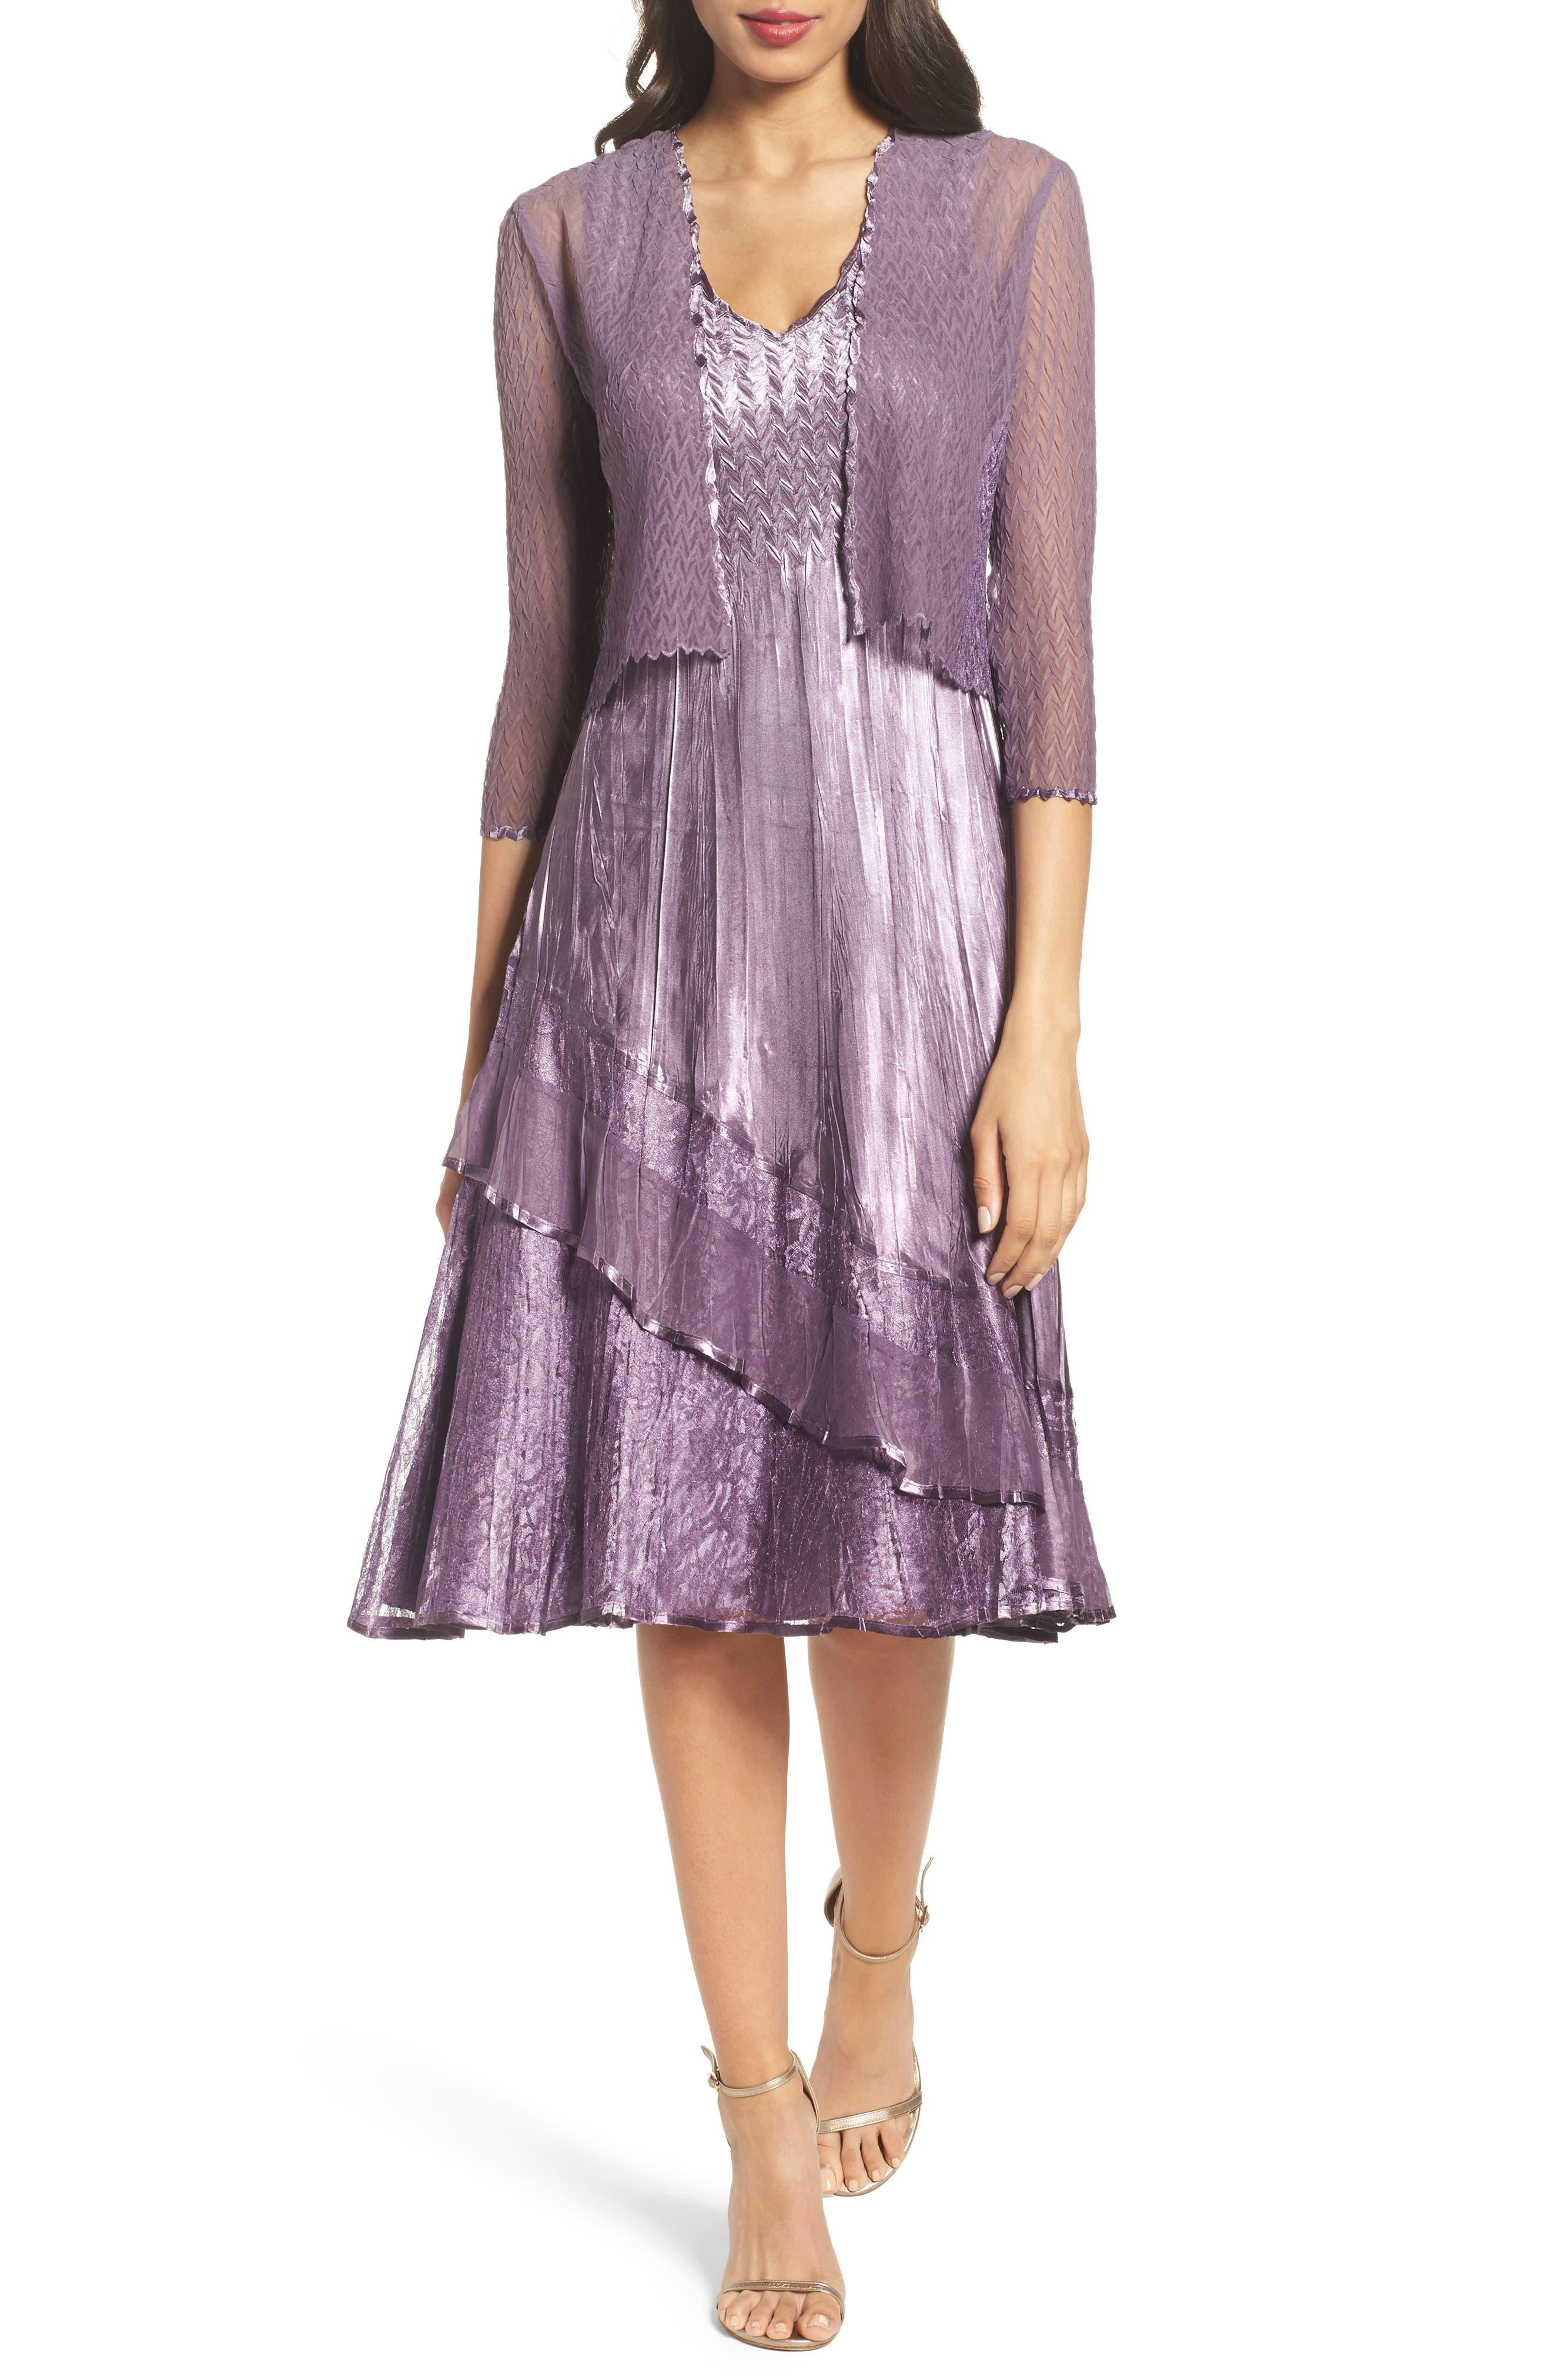 Alternate Image 1 Selected - Komarov Charmeuse A-Line Dress & Chiffon Jacket (Regular & Petite)